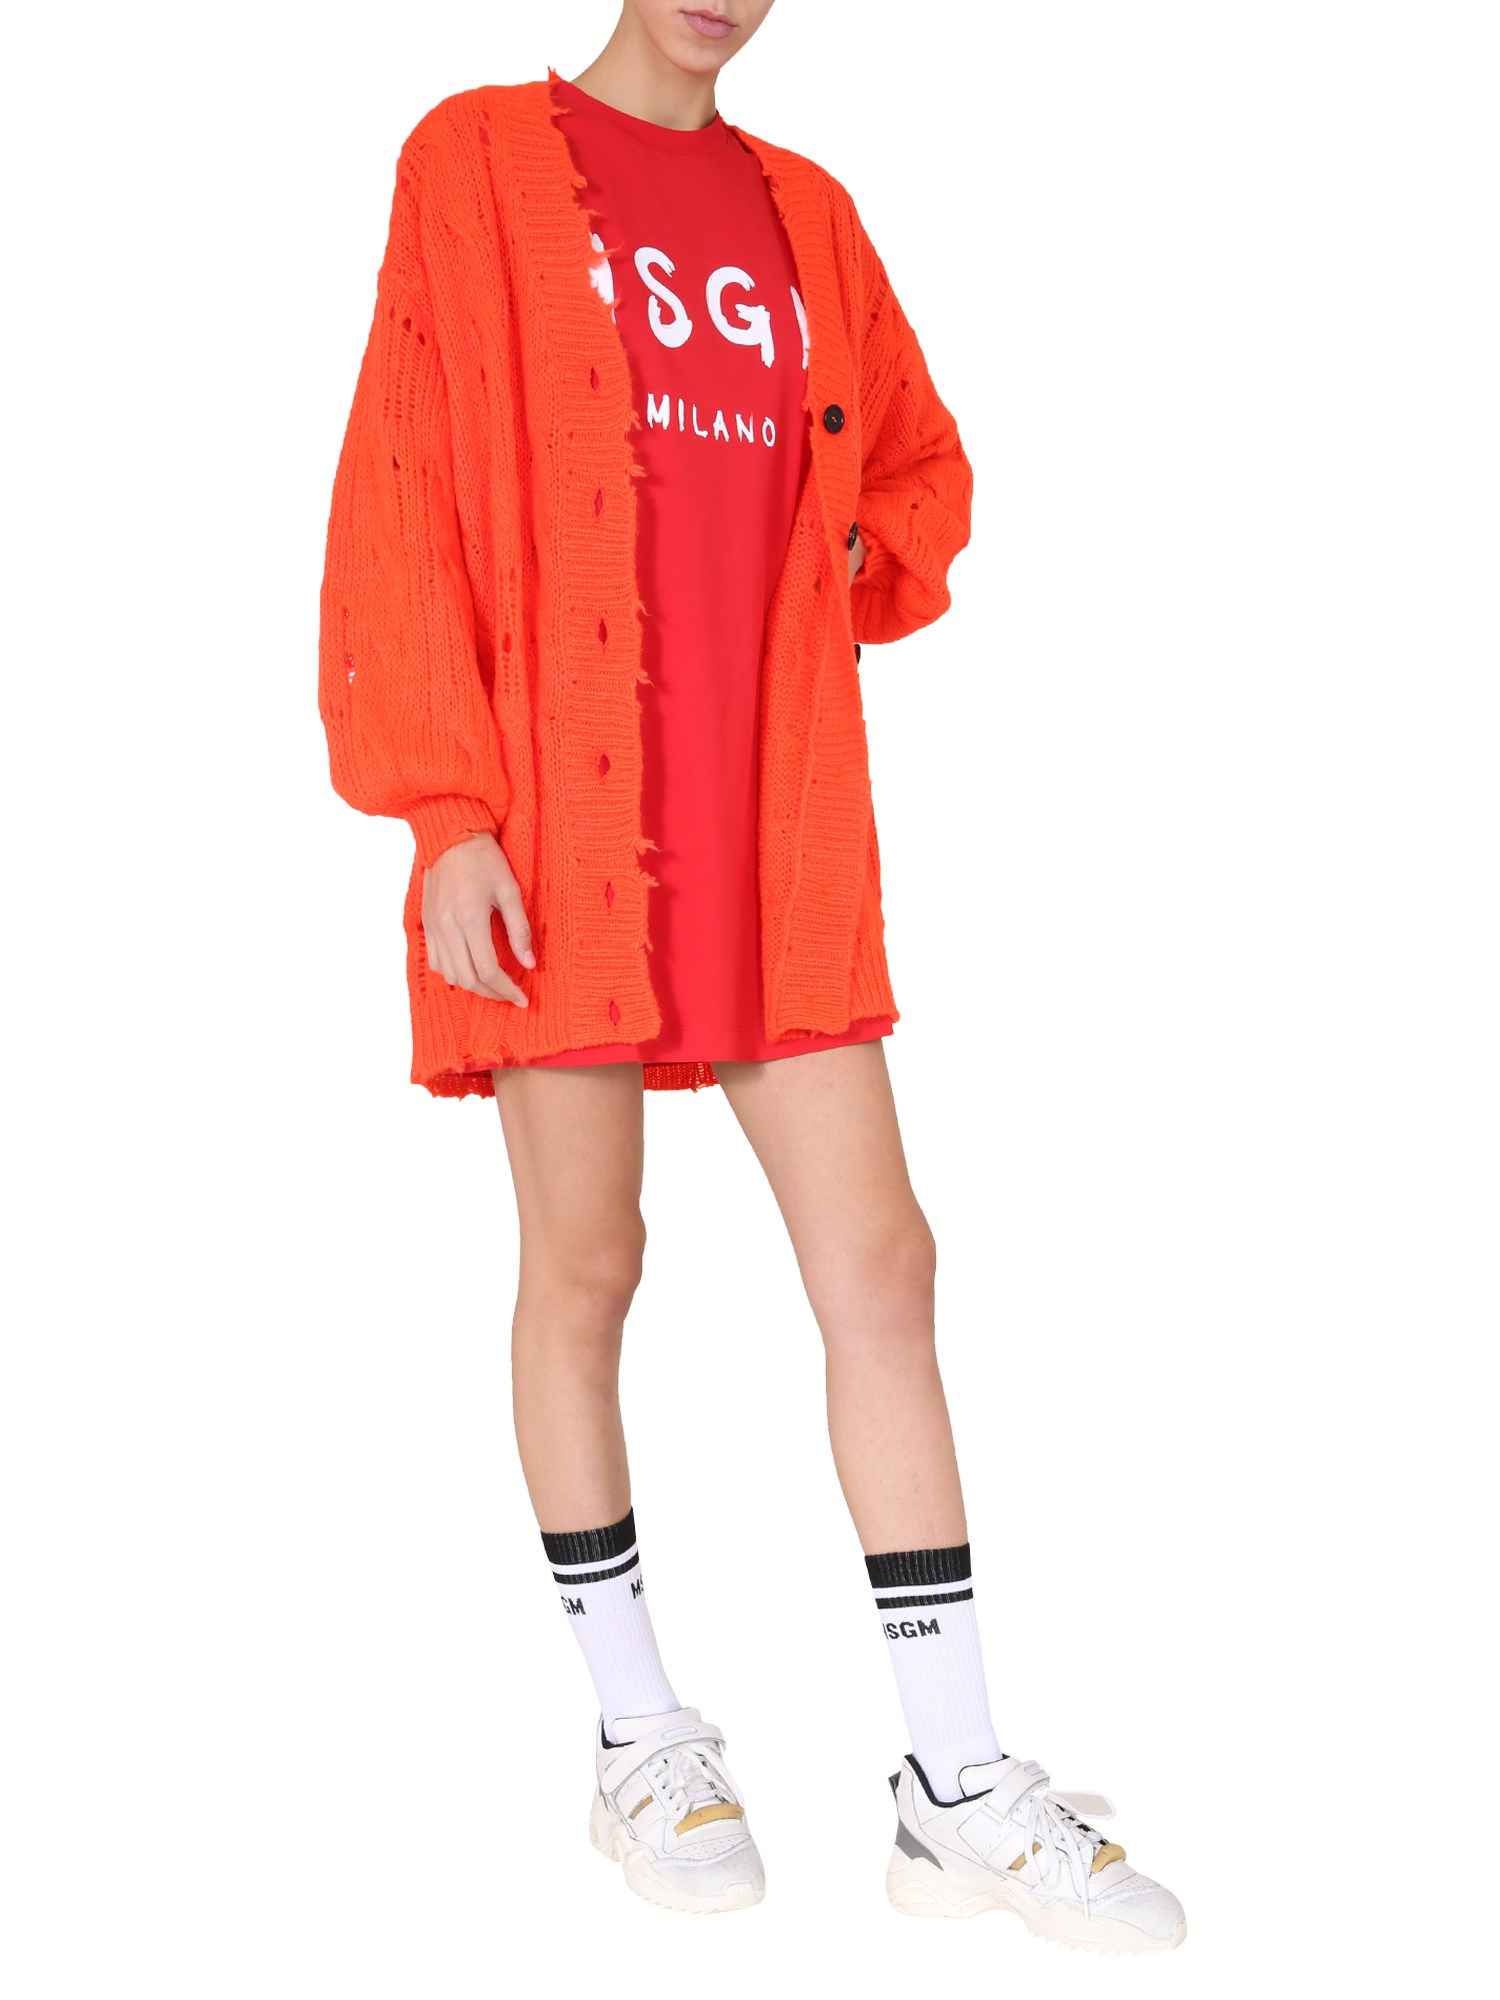 Msgm ROUND NECK DRESS